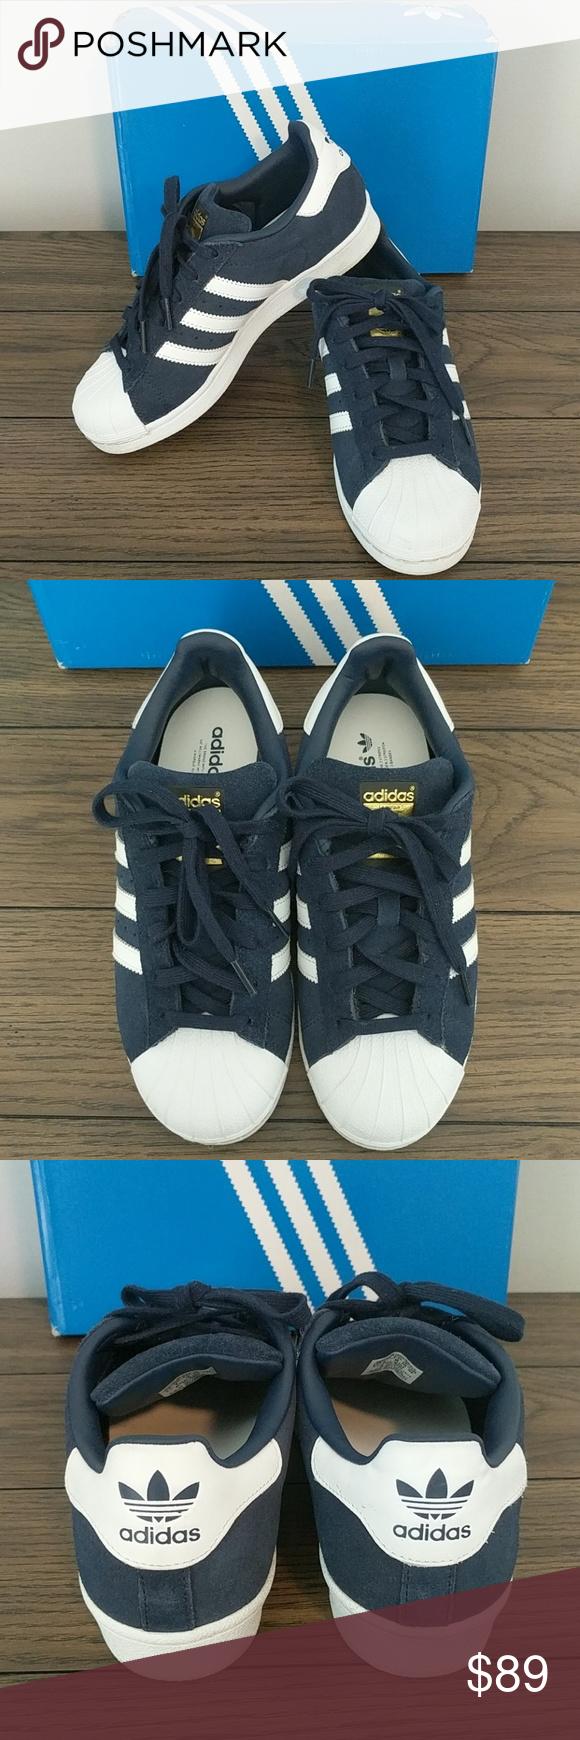 Adidas Superstar Blu Scamosciato Pinterest Adidas Superstar